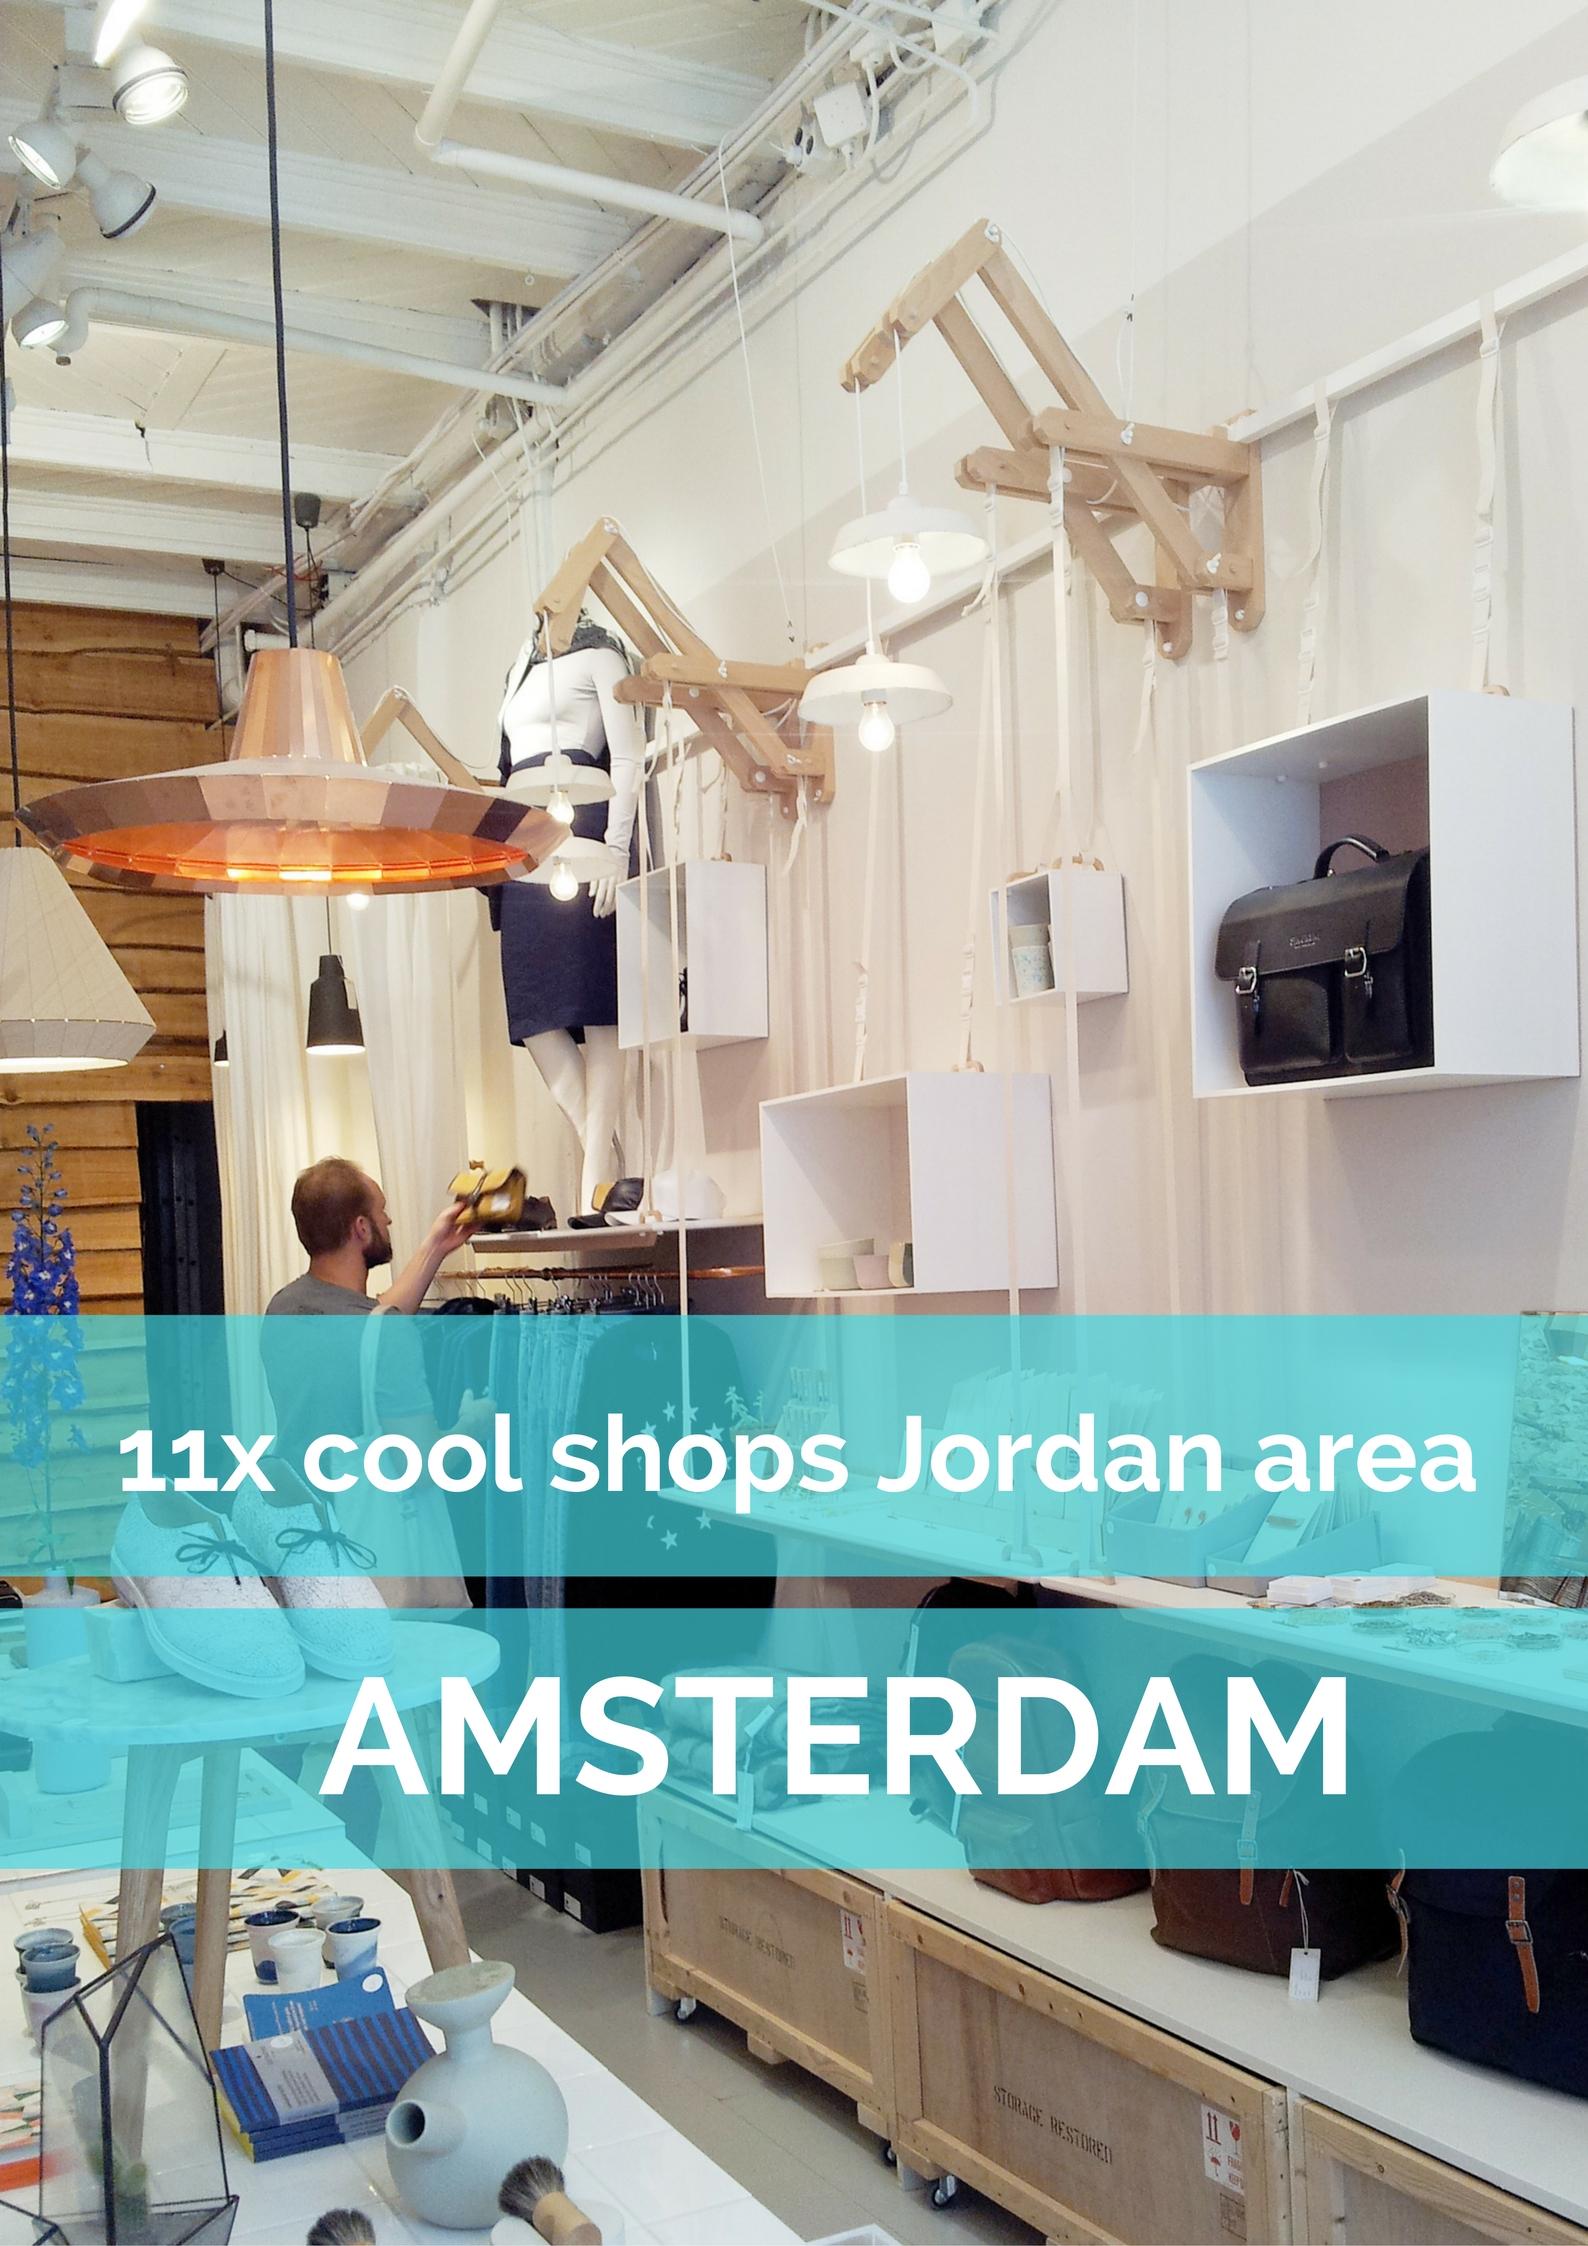 11x cool shops Jordan area, Amsterdam - Map of Joy